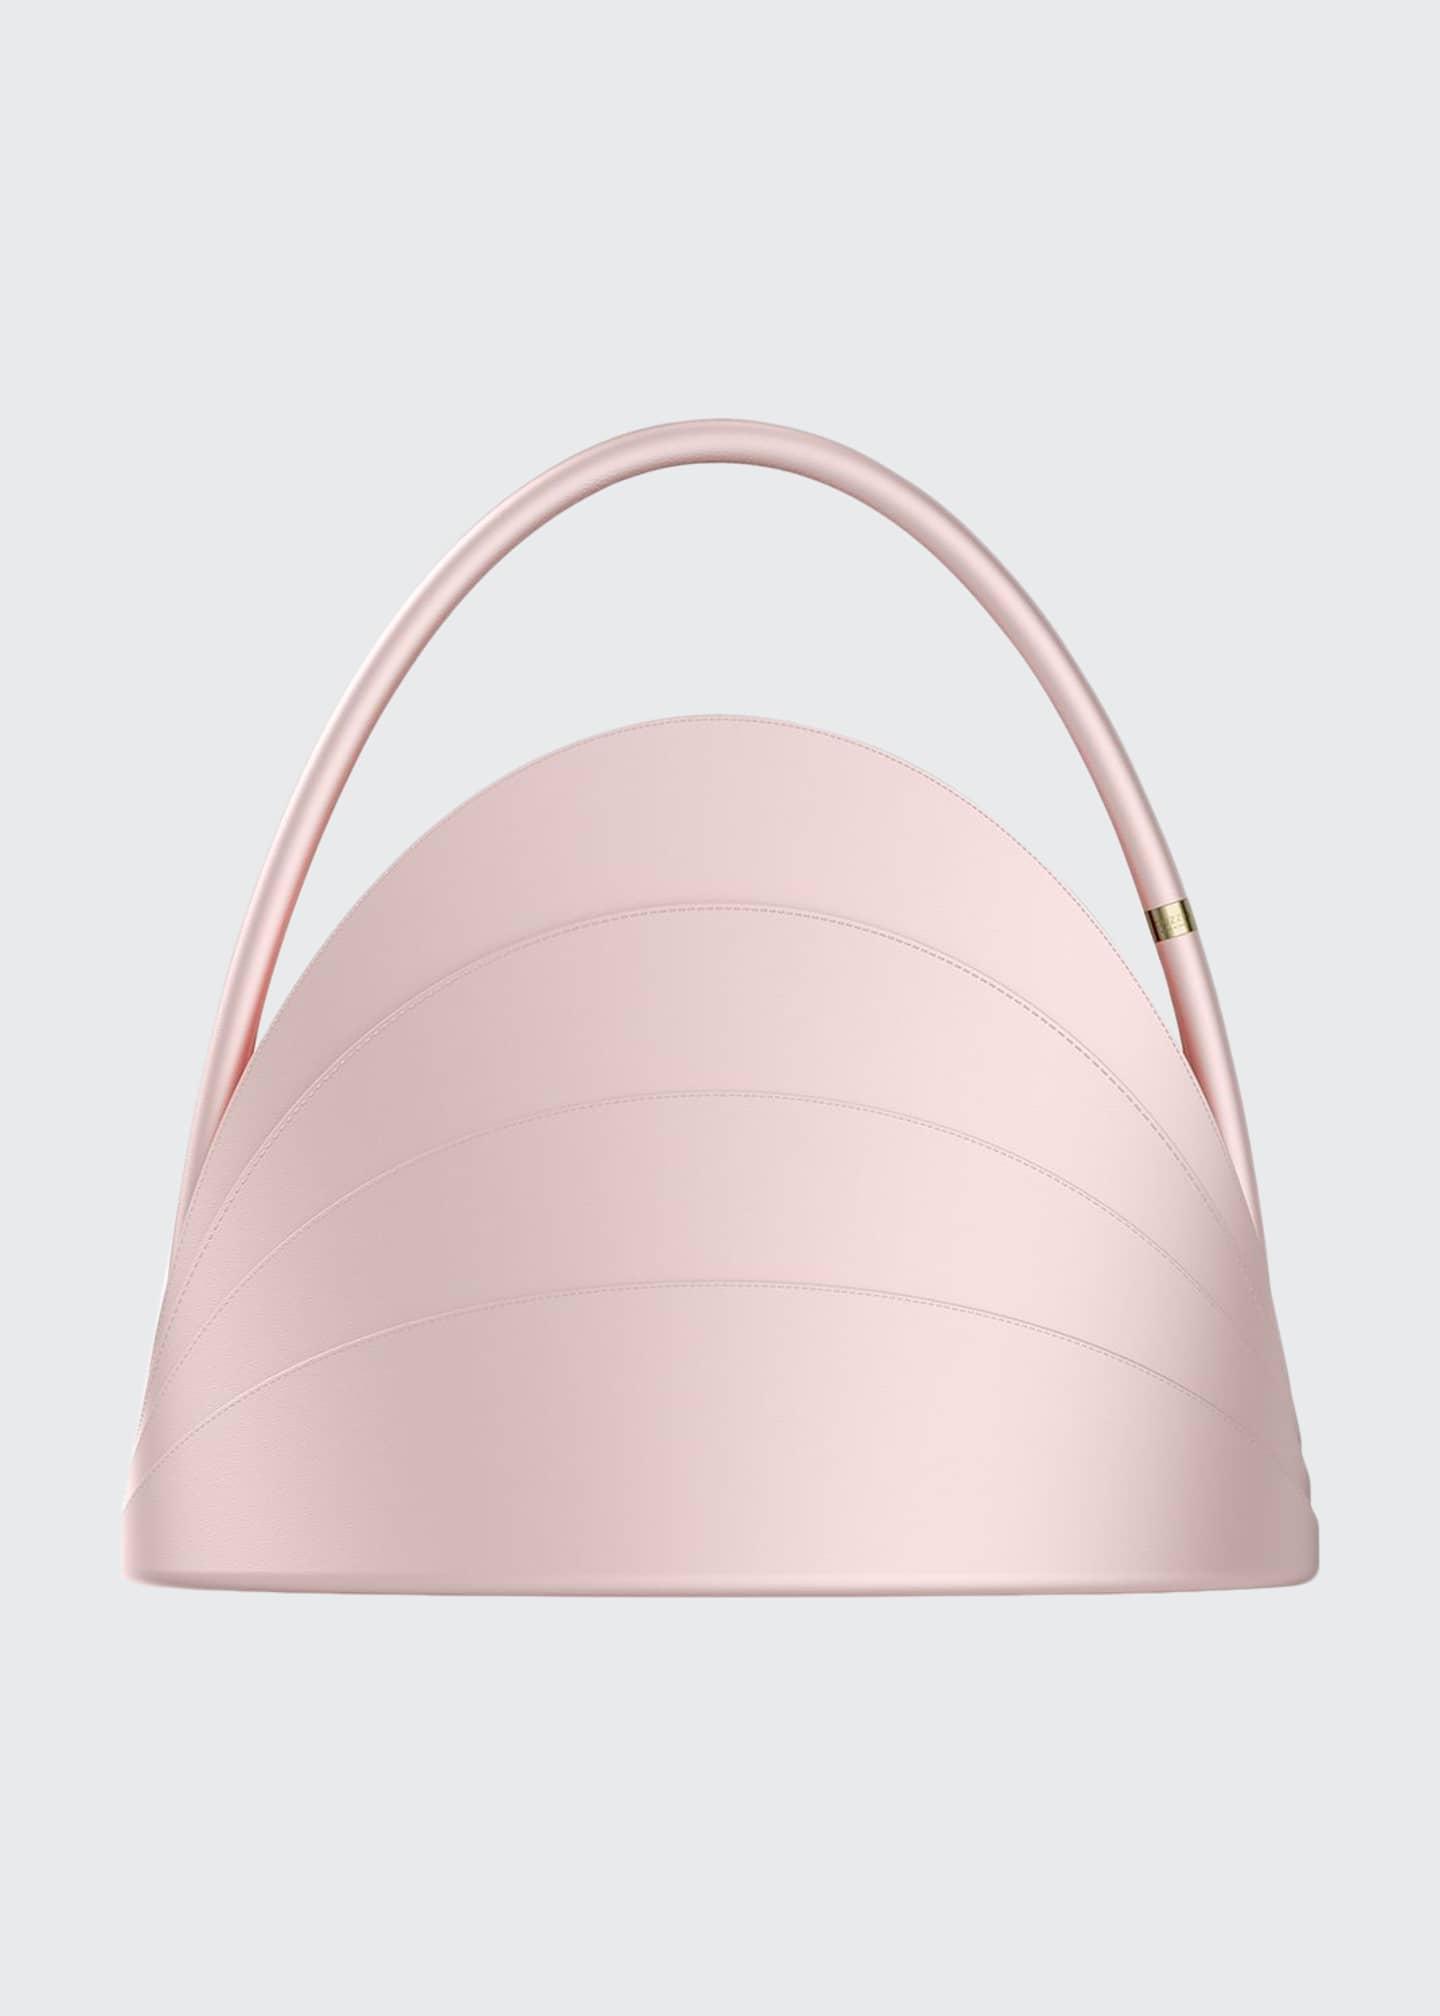 Gabo Guzzo Millefoglie Layered Top-Handle Bag, Pink